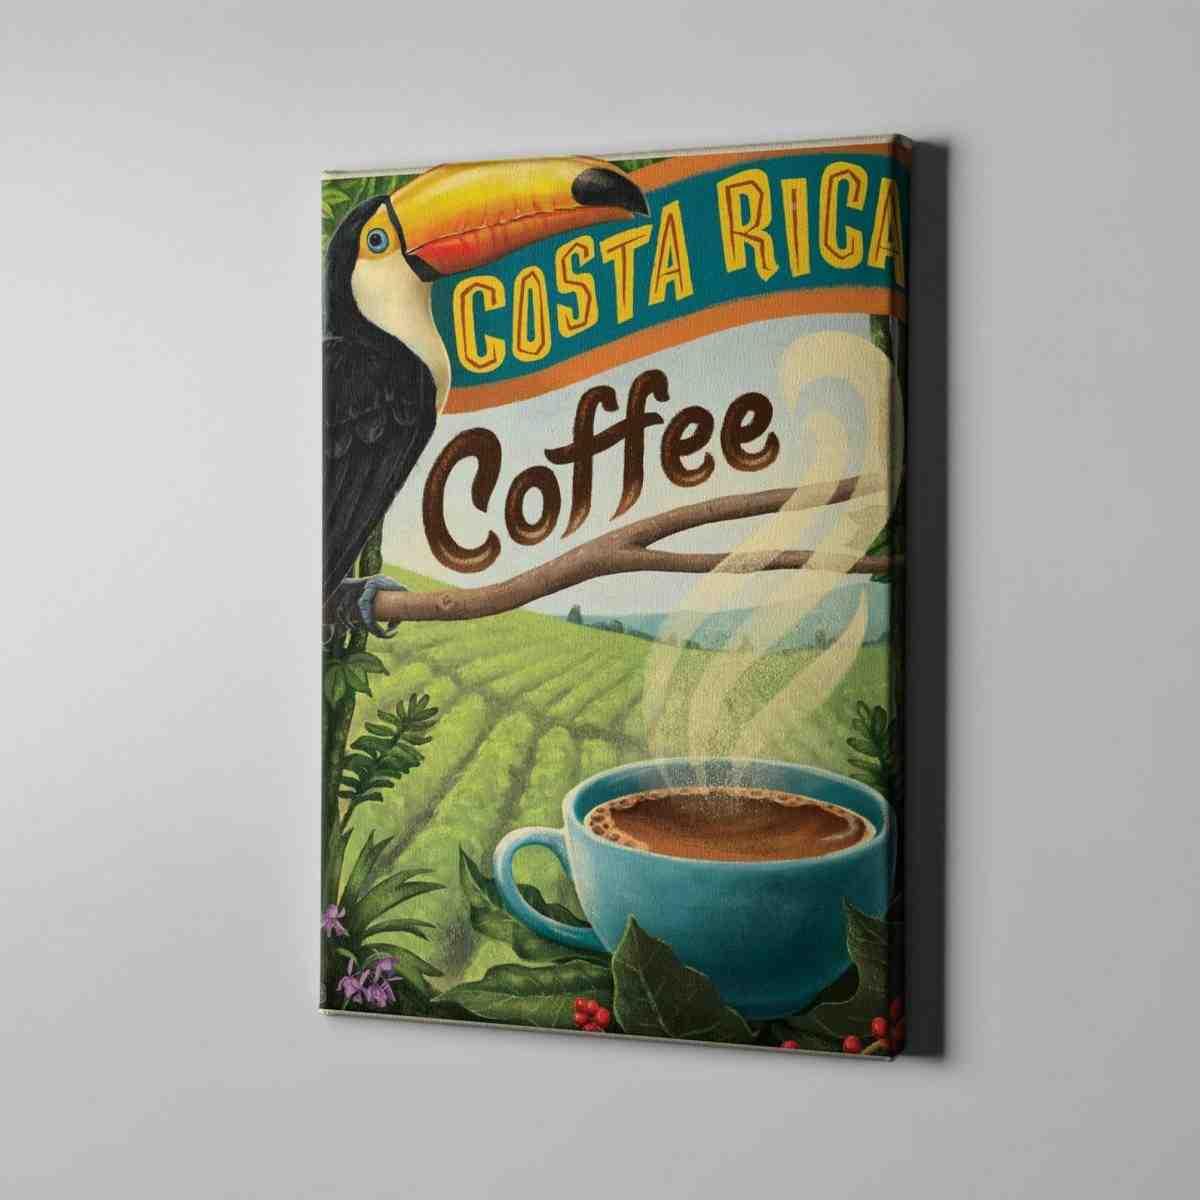 Коста-рика: умный шоппинг в сан-хосе